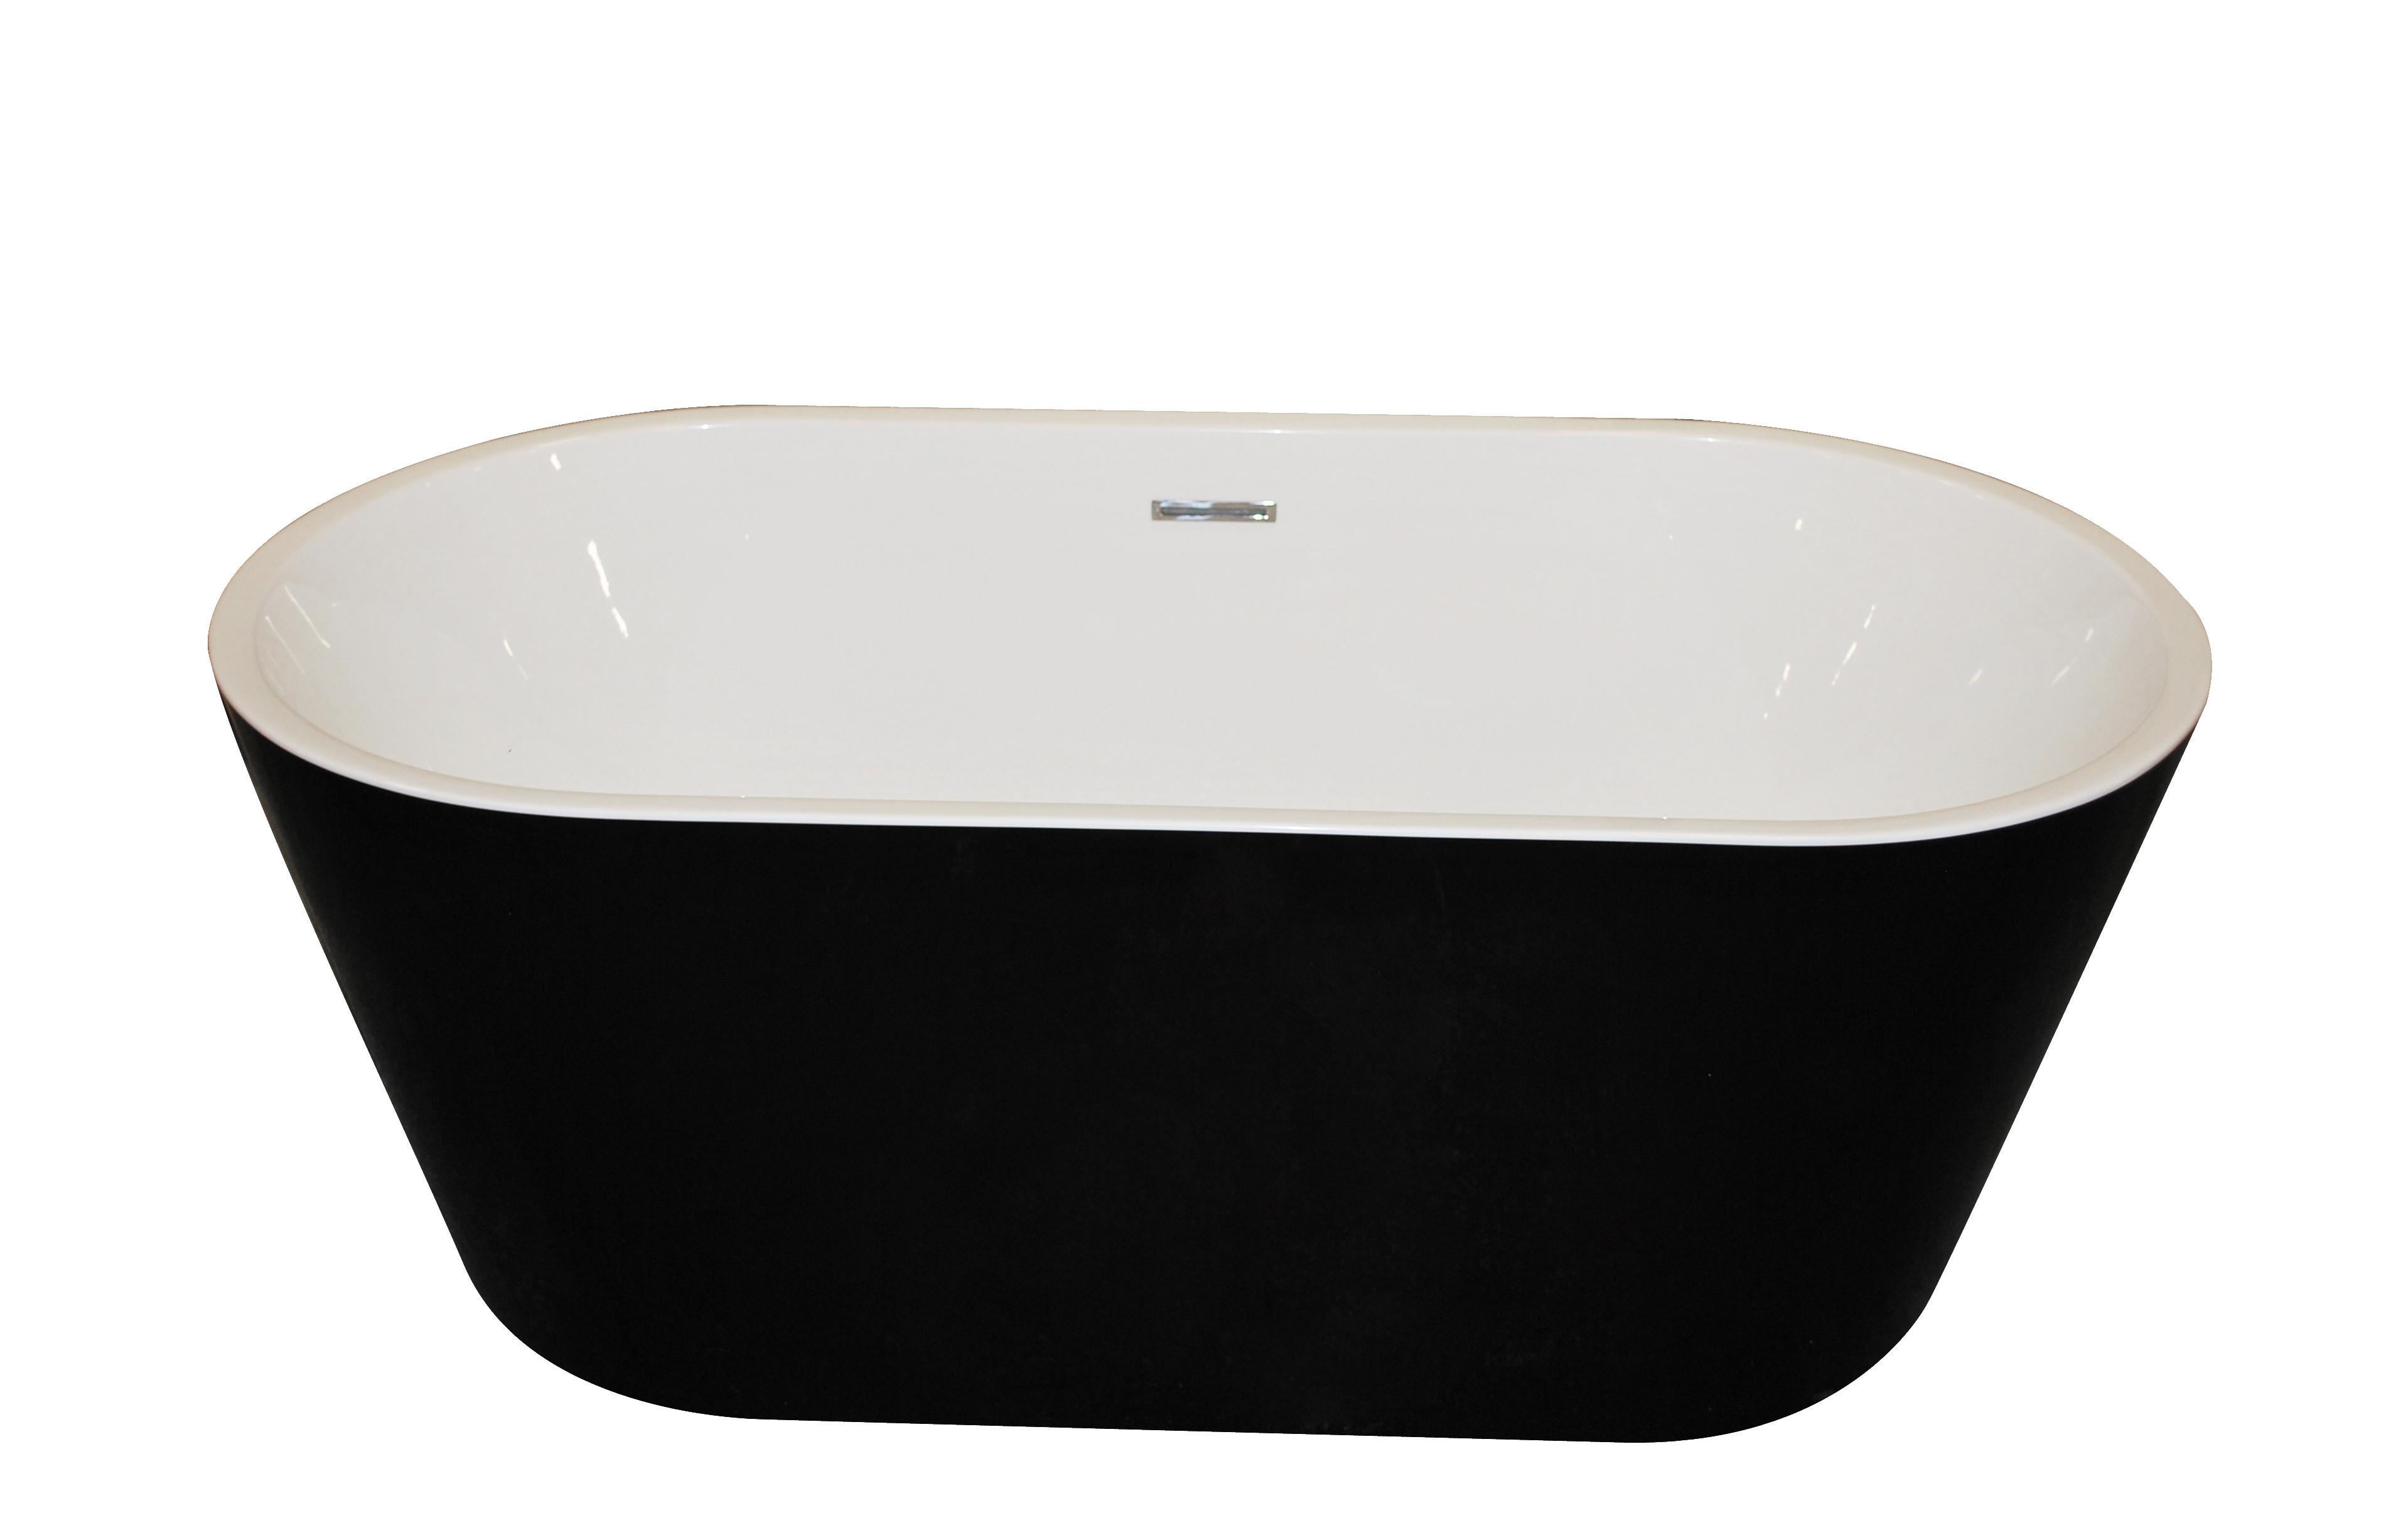 Anzzi FT-AZ012 Dualita Center Drain Freestanding Bathtub in Glossy Black